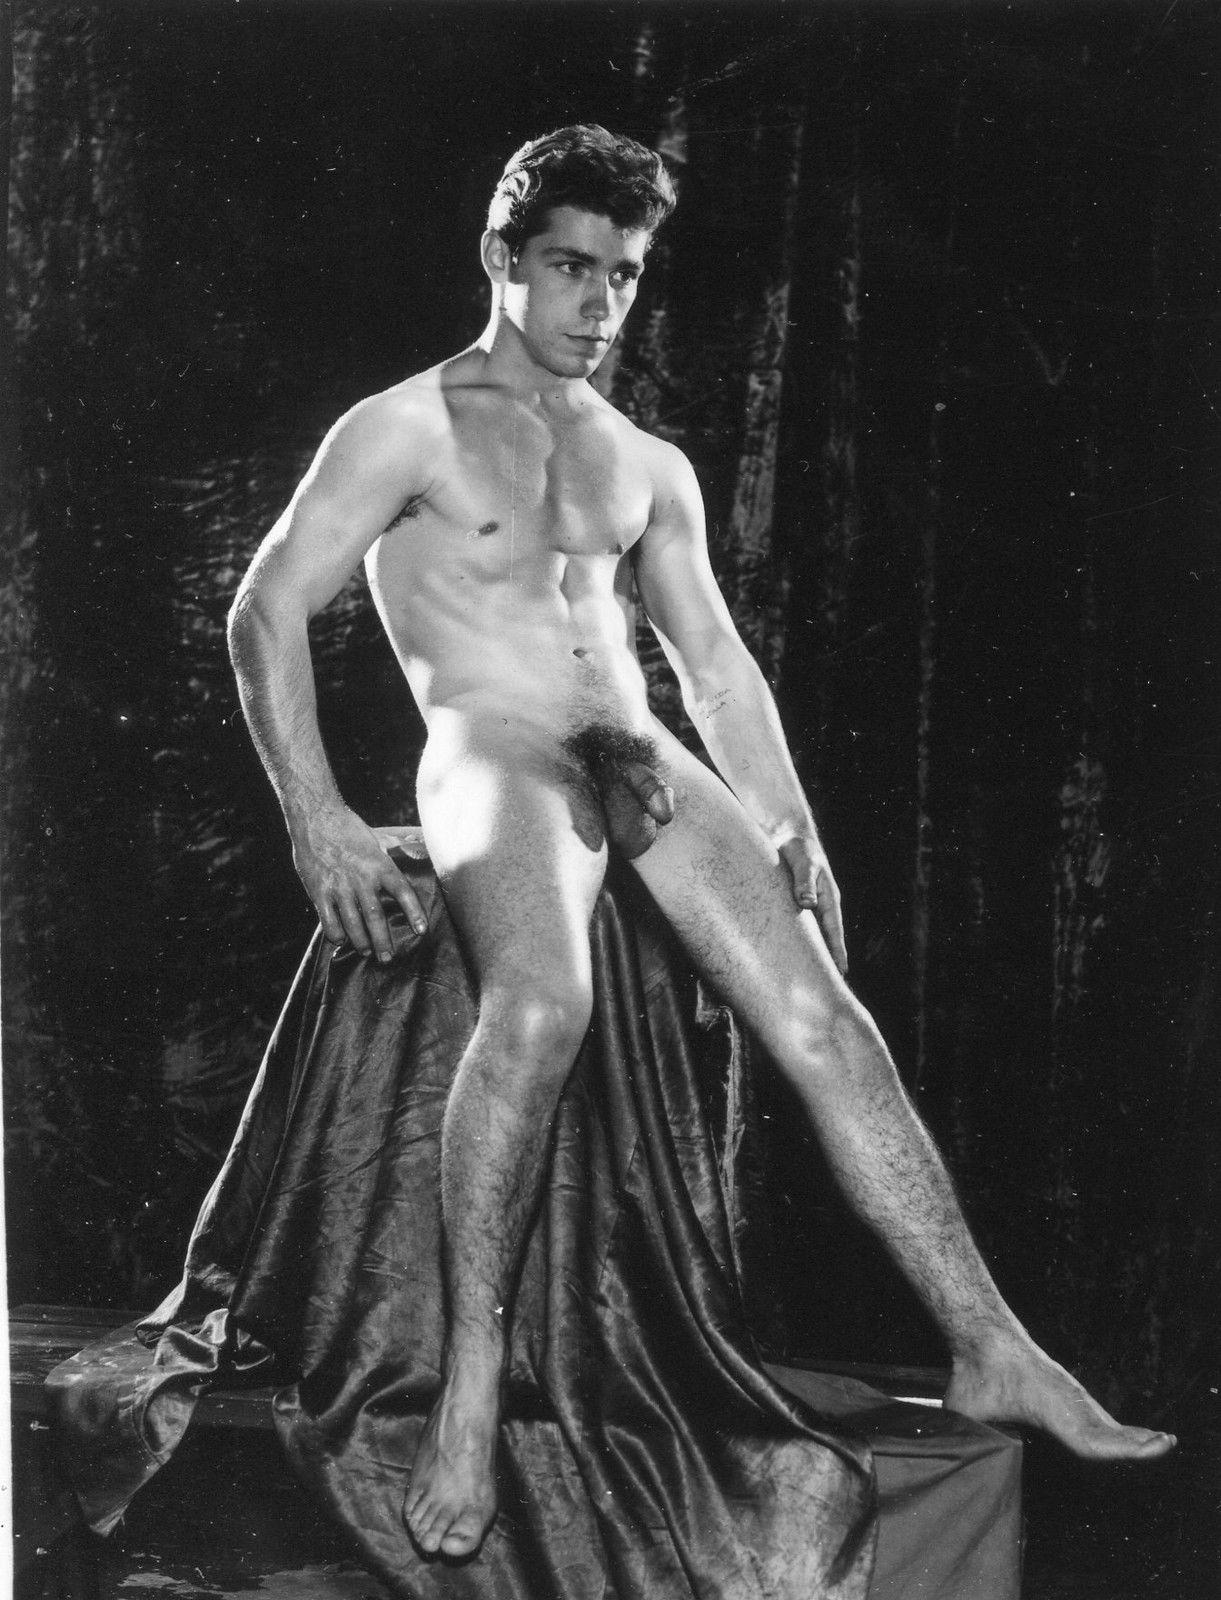 Male Models Vintage Beefcake-5835